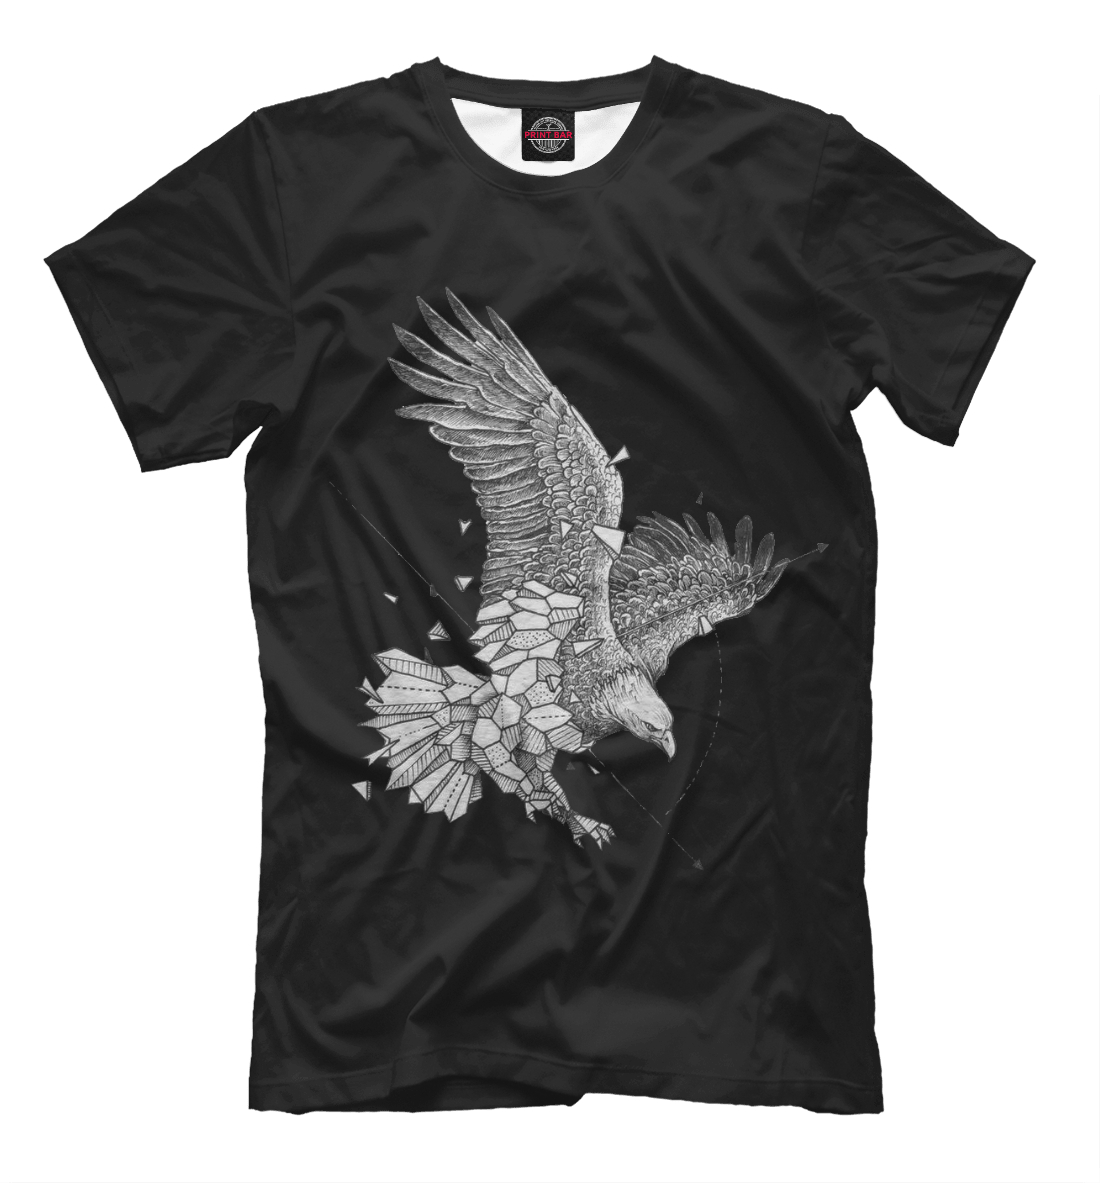 Купить Geometric dark eagle, Printbar, Футболки, HIP-658767-fut-2